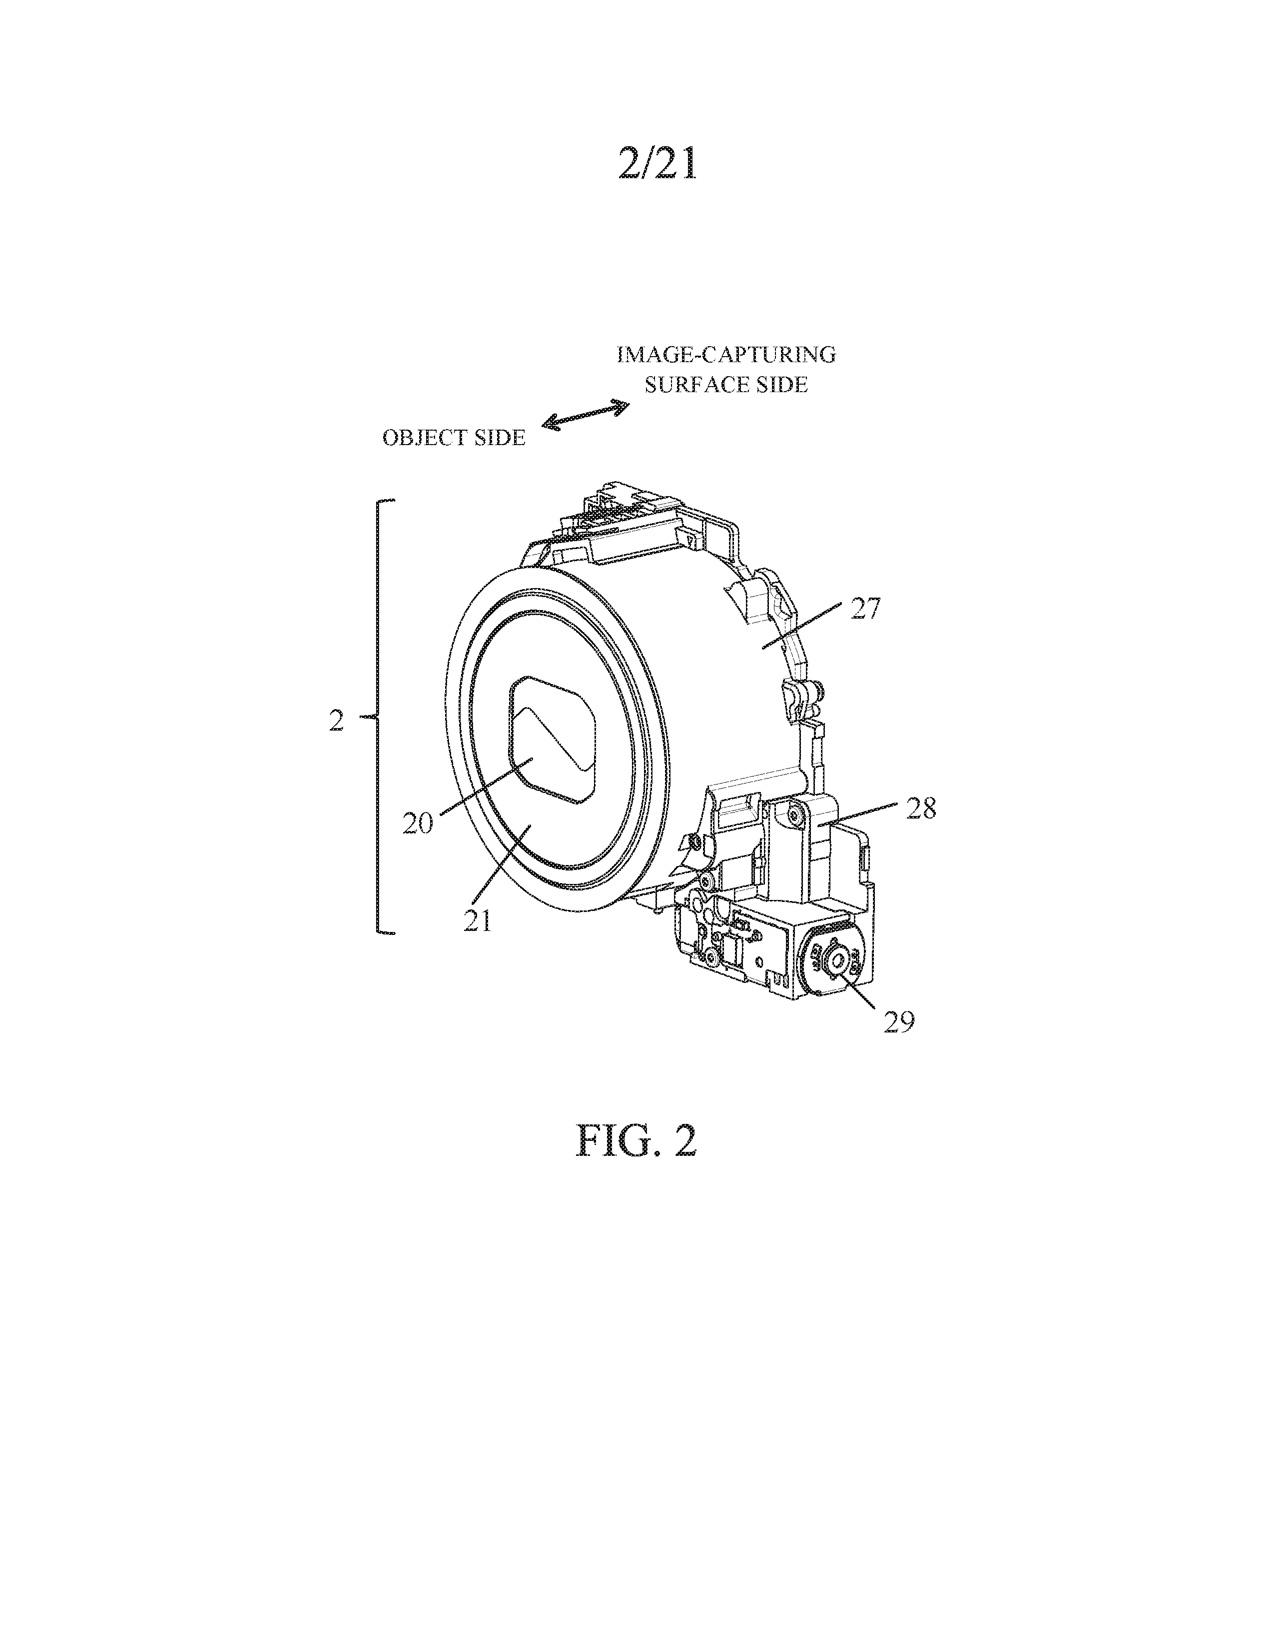 Canon Patent Application For 360 Degree Camera With 8 Zoom Lenses Diagram Via Letsgodigital